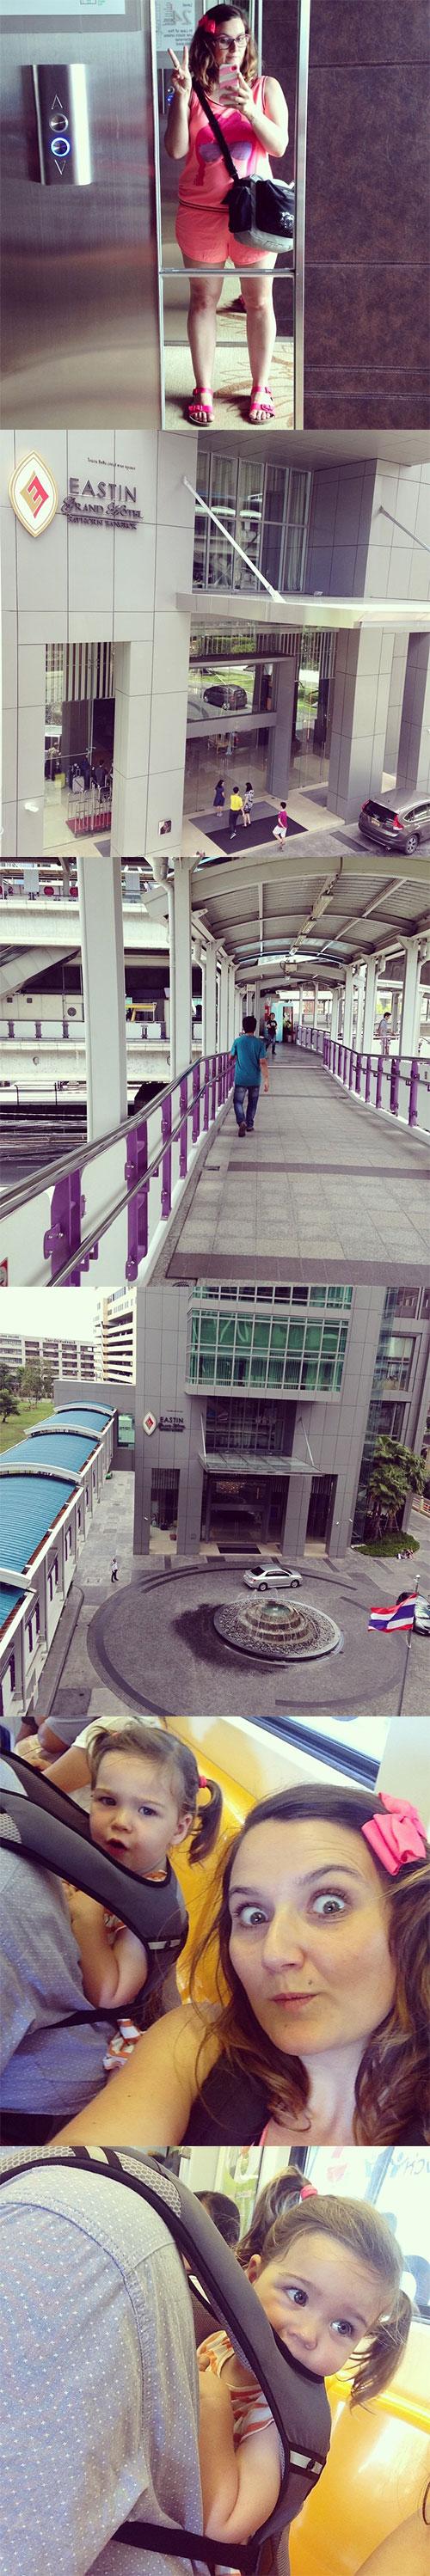 Bangkok-voyage-famille-pimpandpomme-thailande-ChaoPraya-6